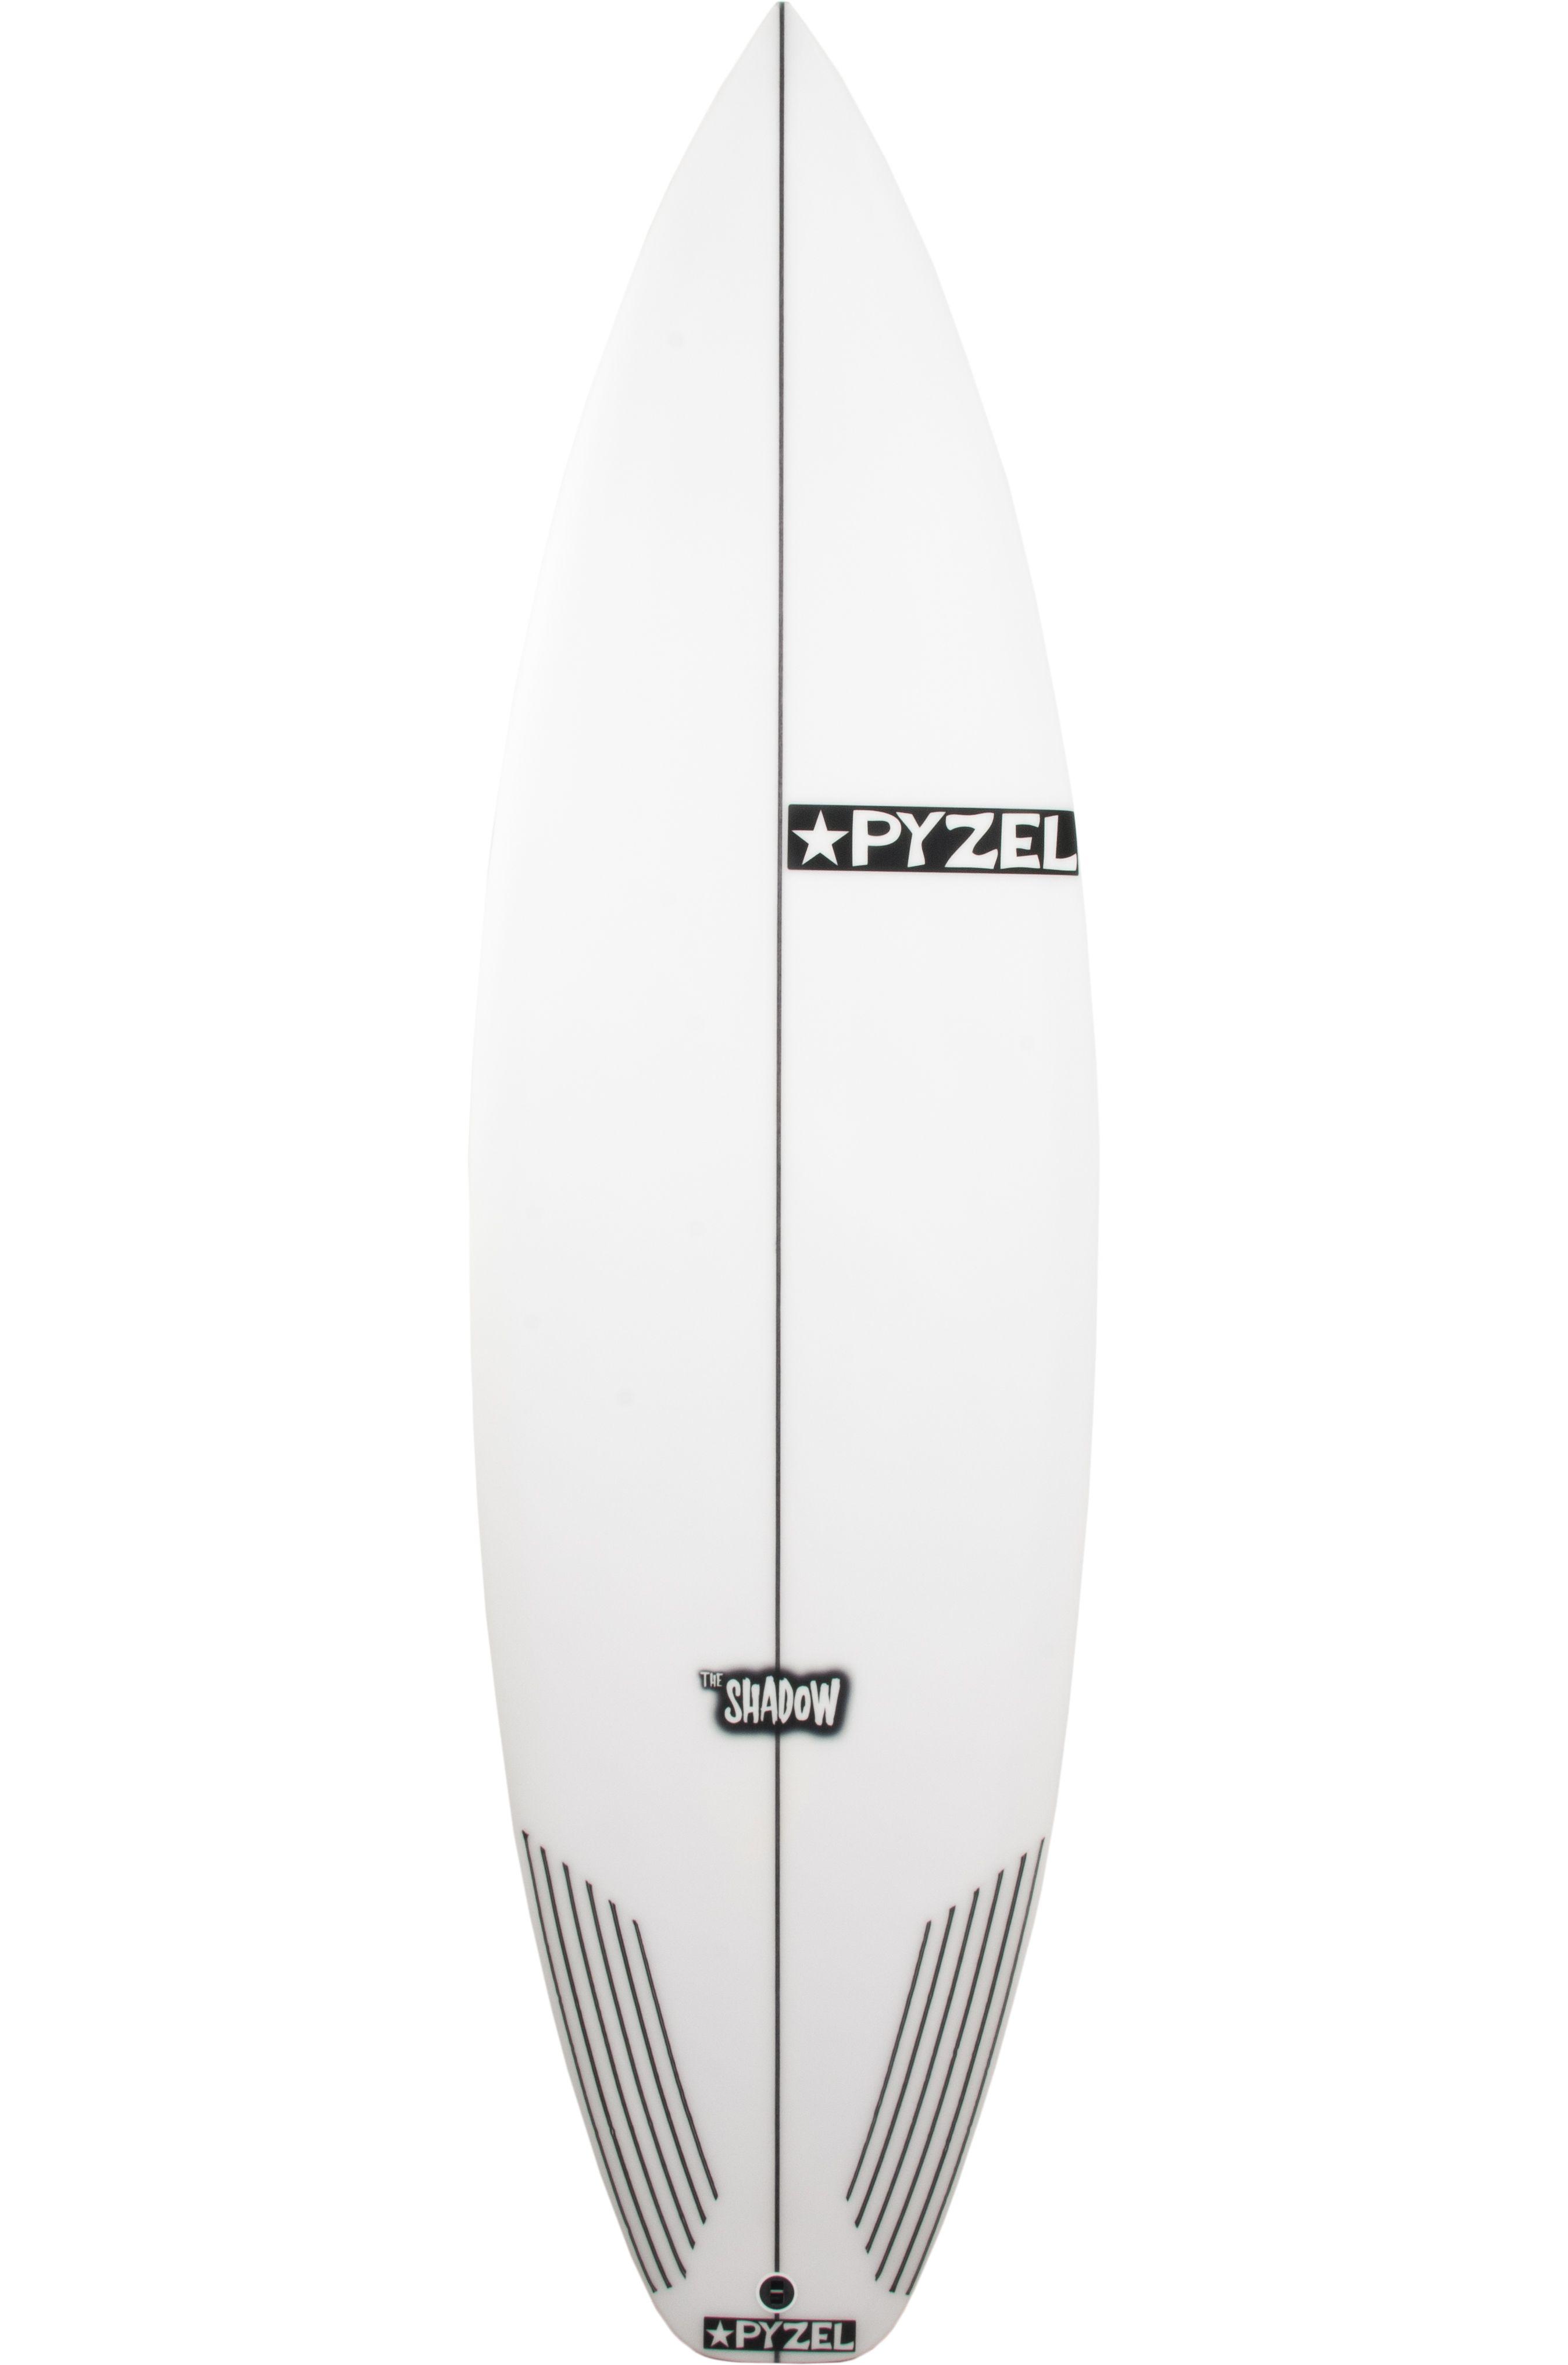 Prancha Surf Pyzel 6'0 SHADOW Squash Tail - White FCS II 6ft0